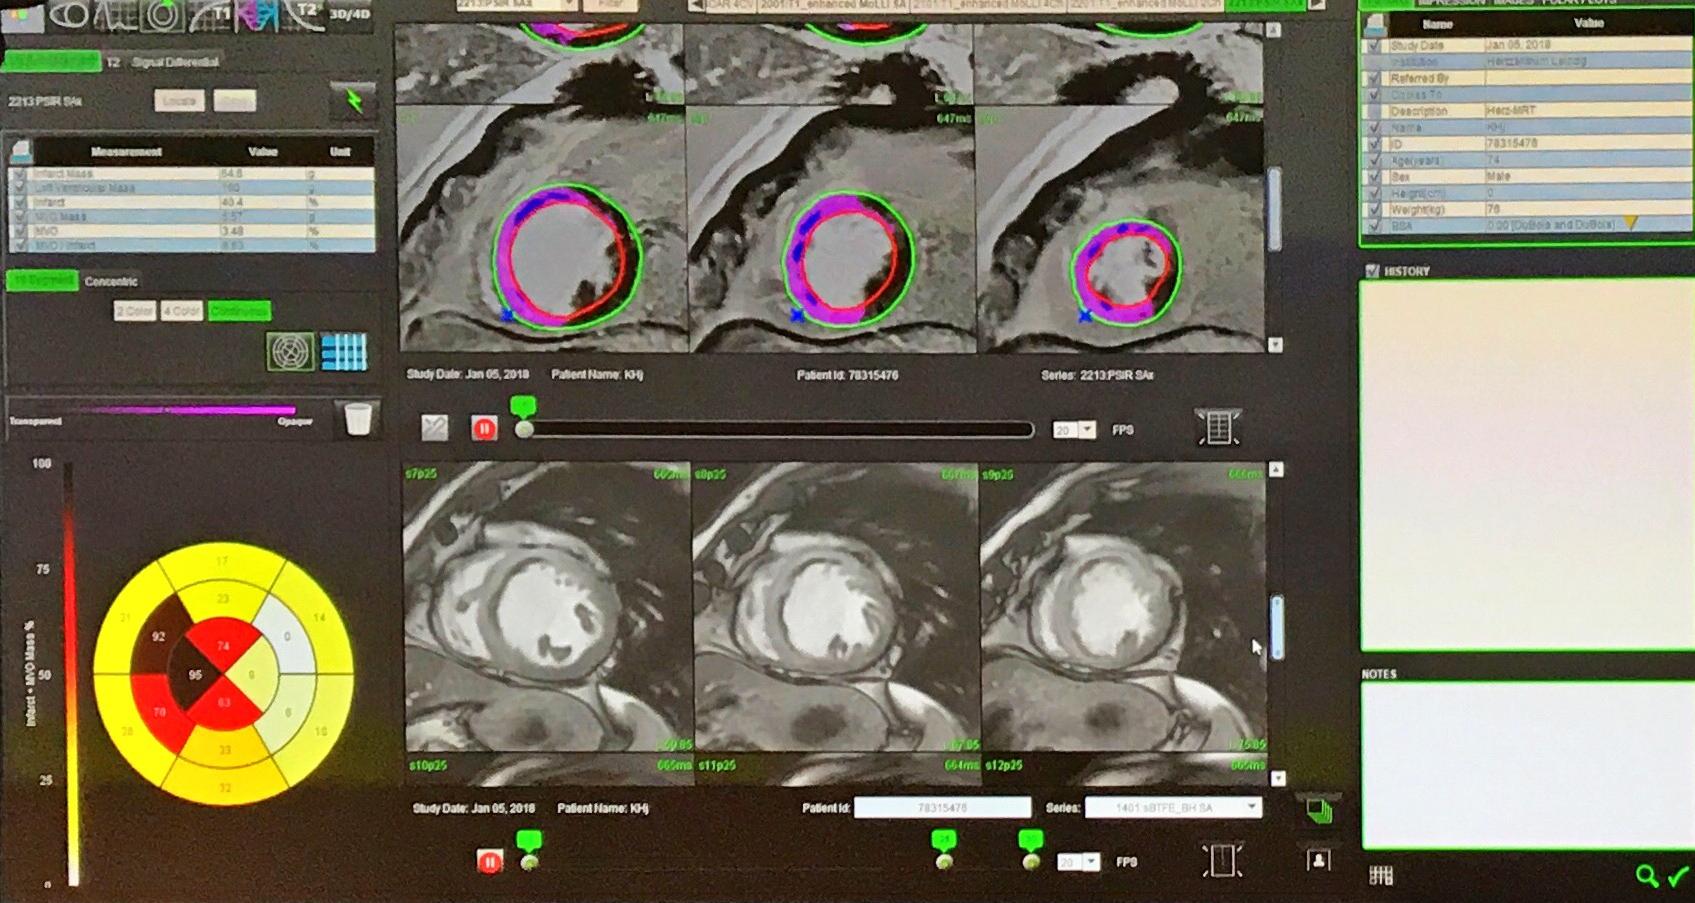 Herzensangelegenheit: Kardiologie Face-off